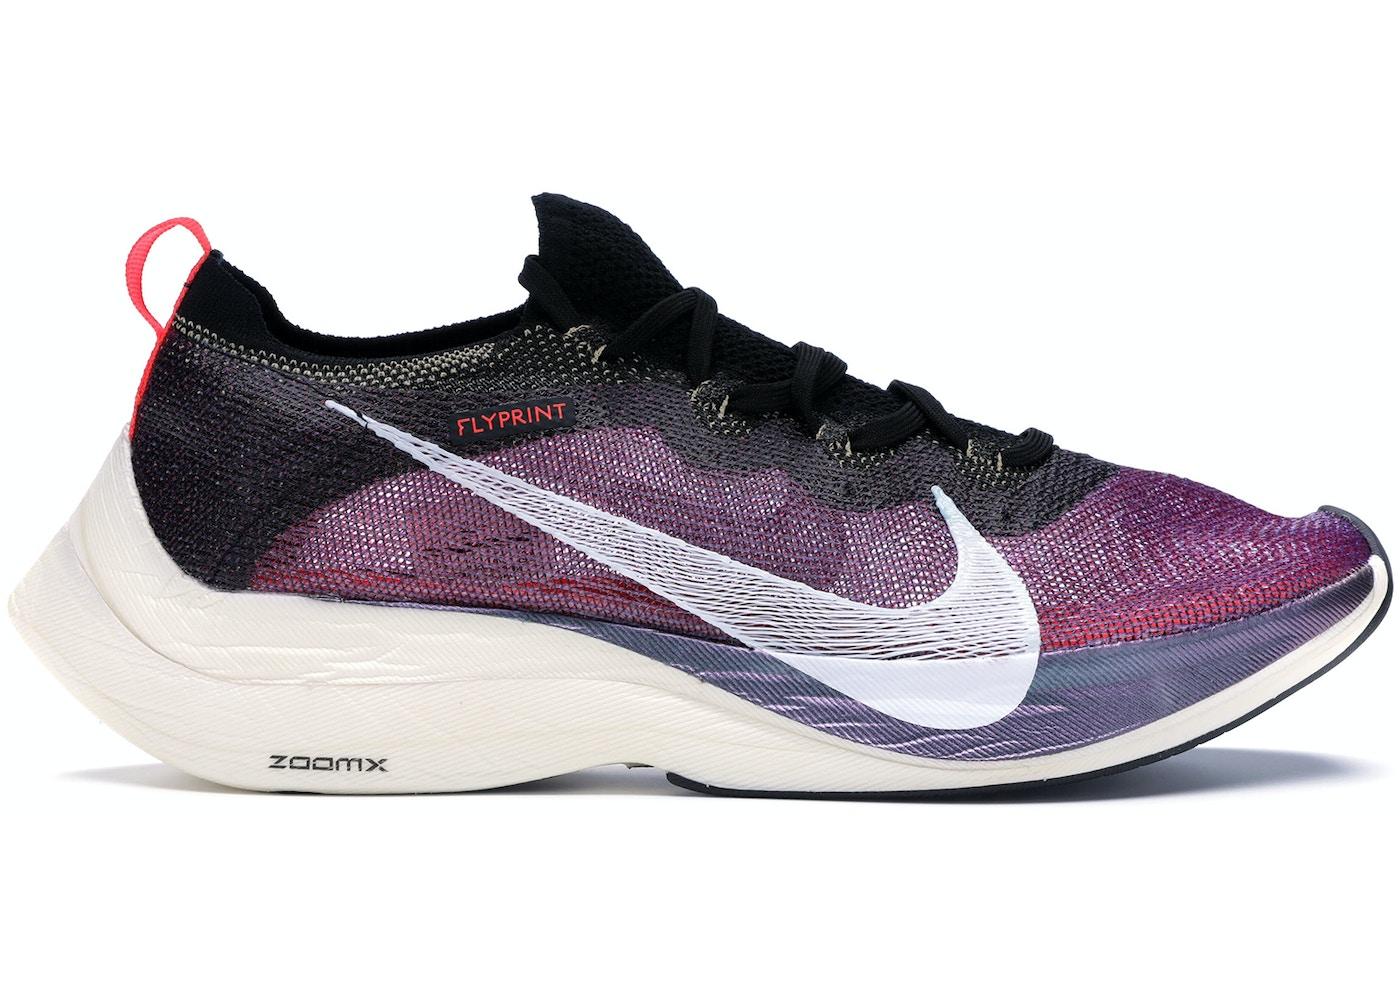 af790e8e9cf1 Nike Zoom Vaporfly Elite Flyprint Chicago NYC Marathon Tokyo 2019 -  BV1385-002